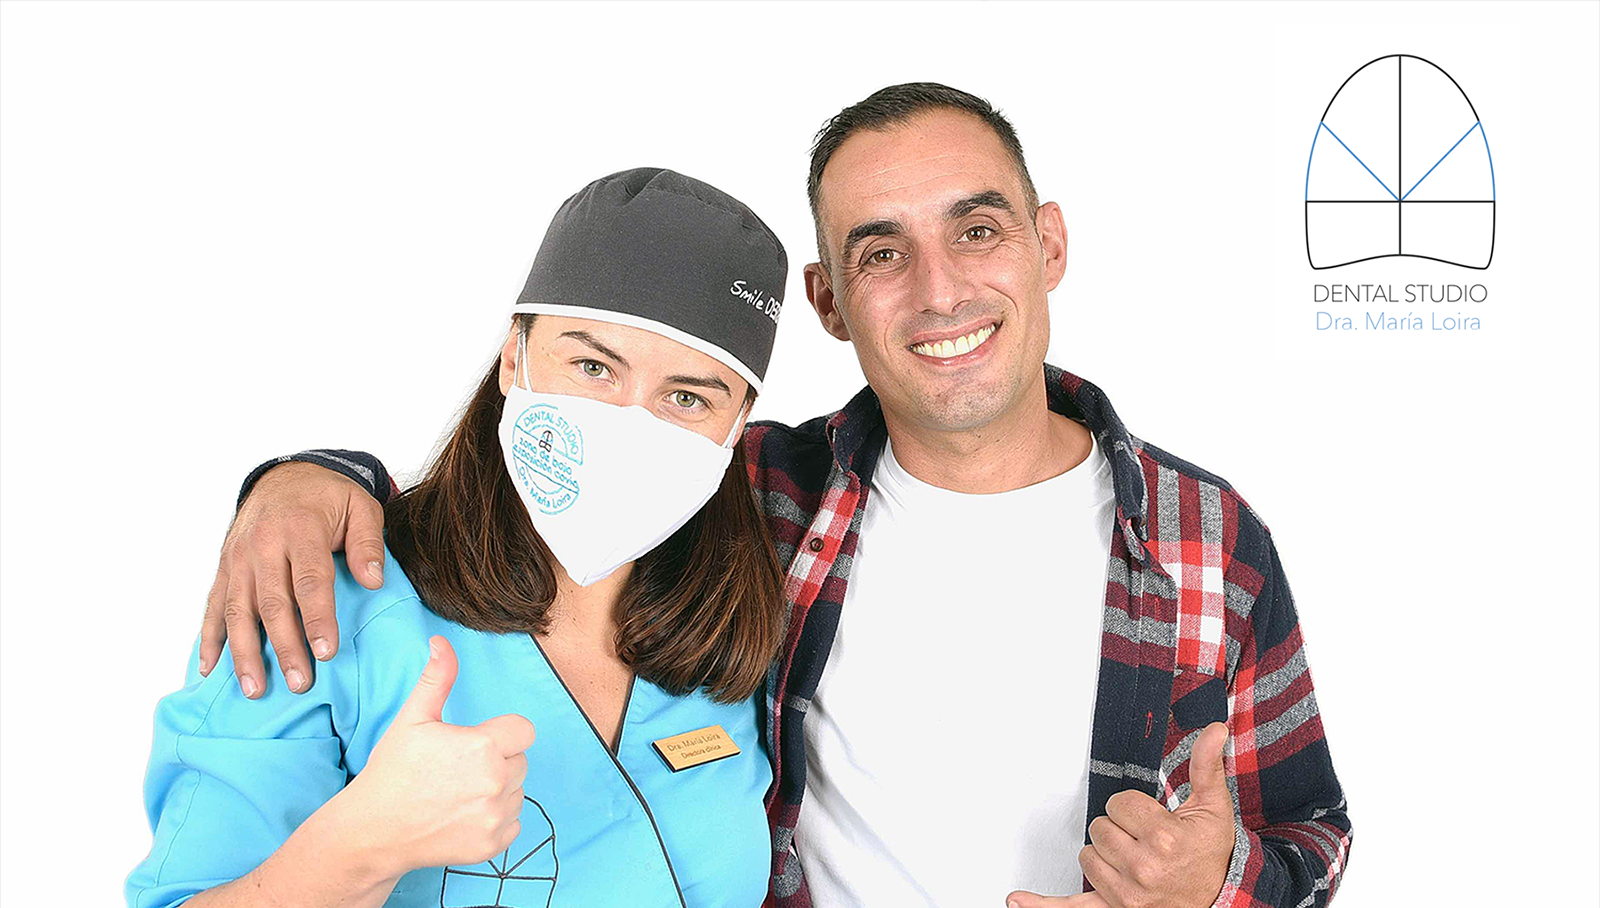 resultado_final_caso_carlota_dentalstudiomarialoira_2